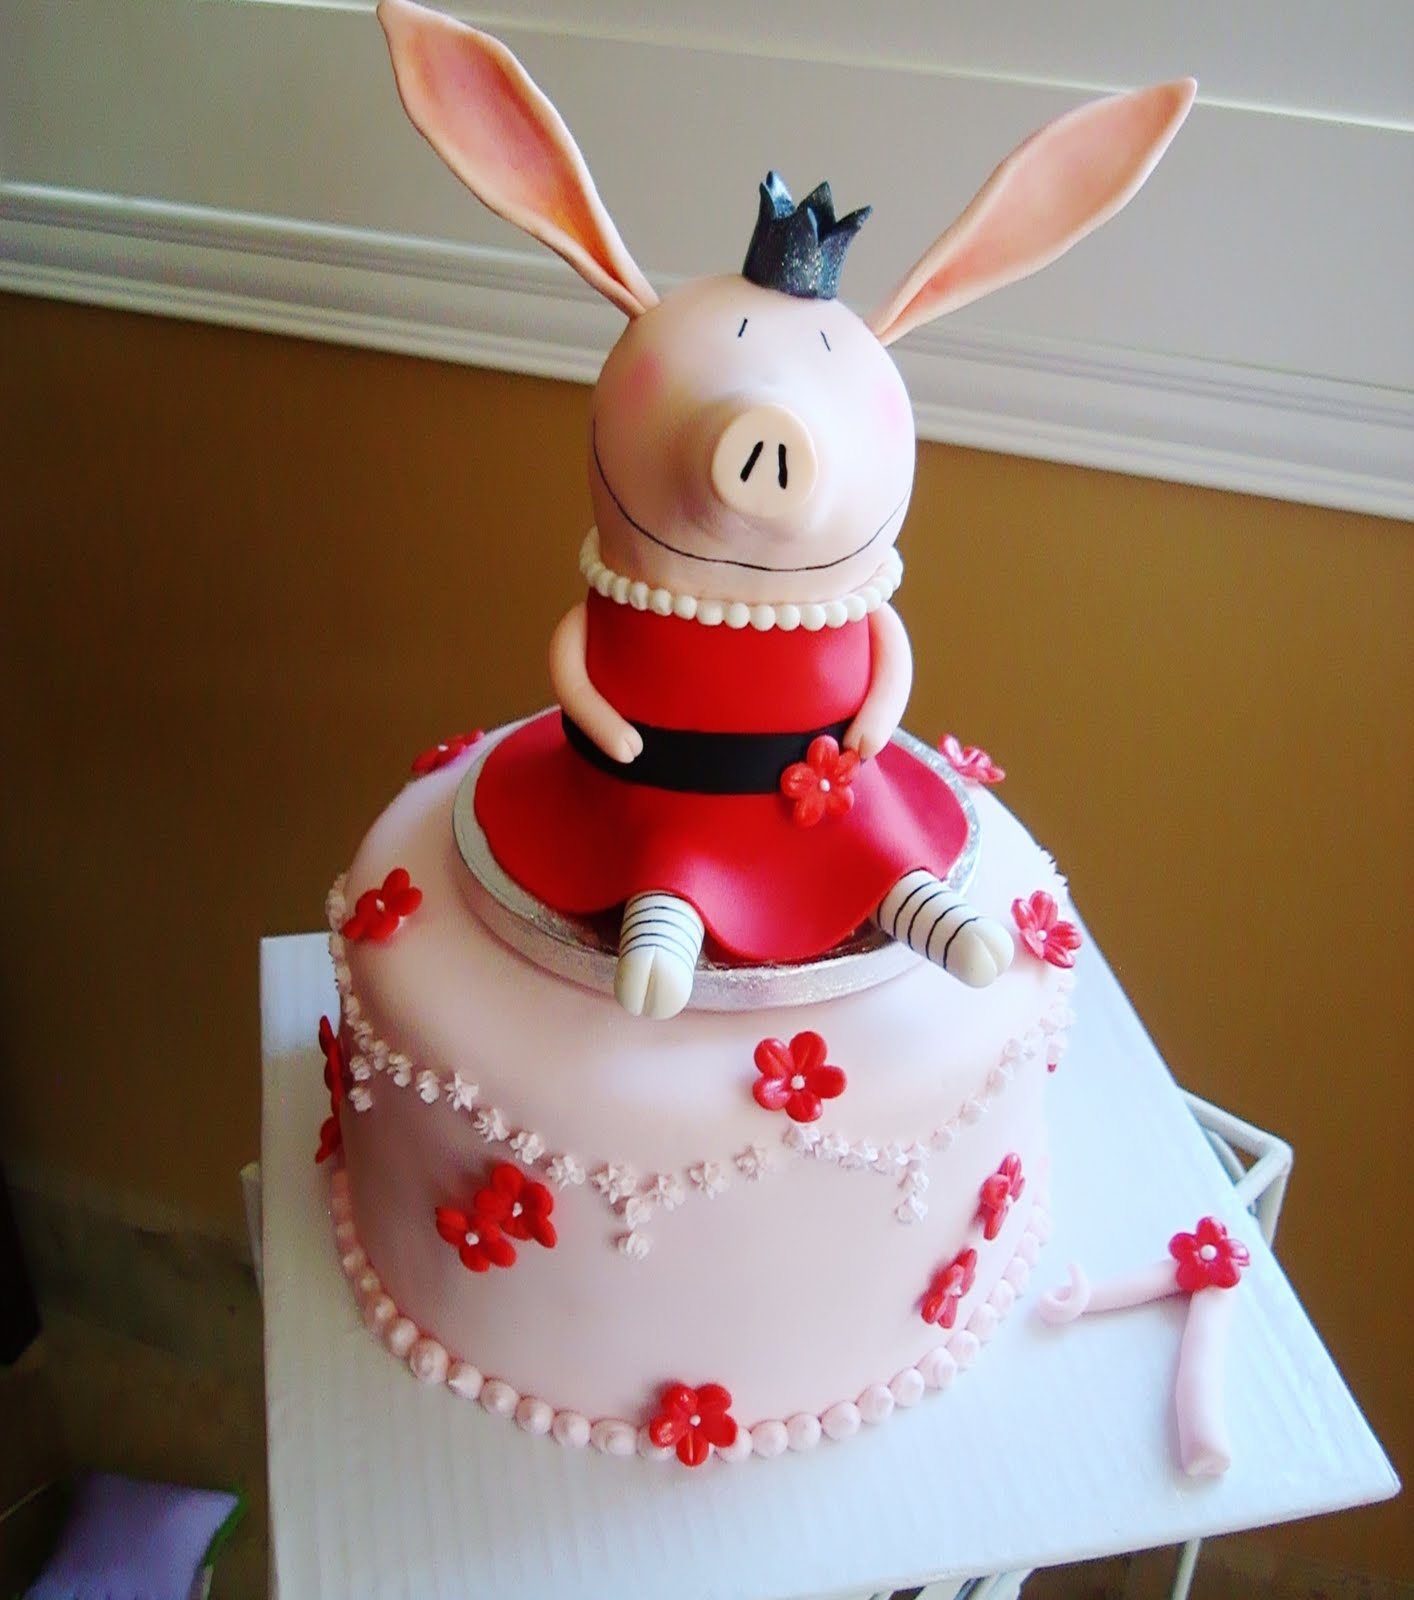 Design Minded: Princess Olivia Cake + Dairy Free